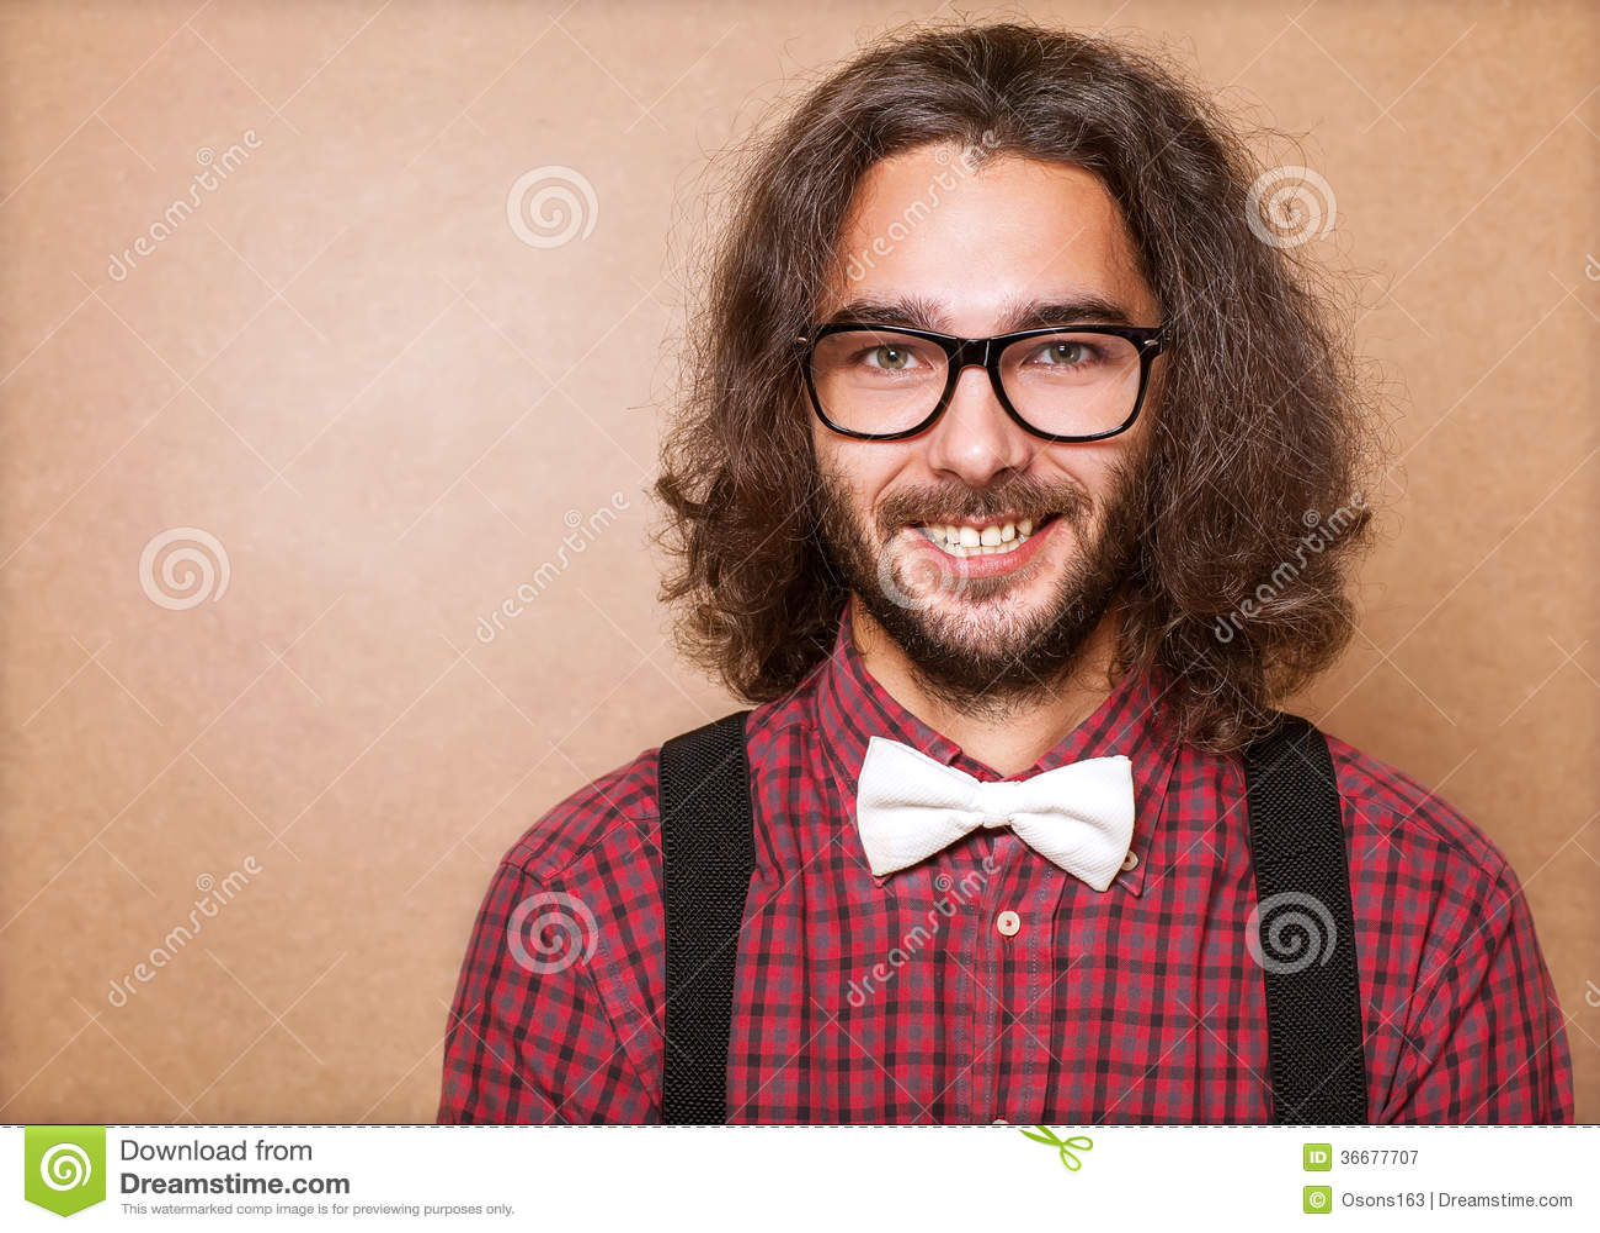 Clothes Subscriptionfor Men